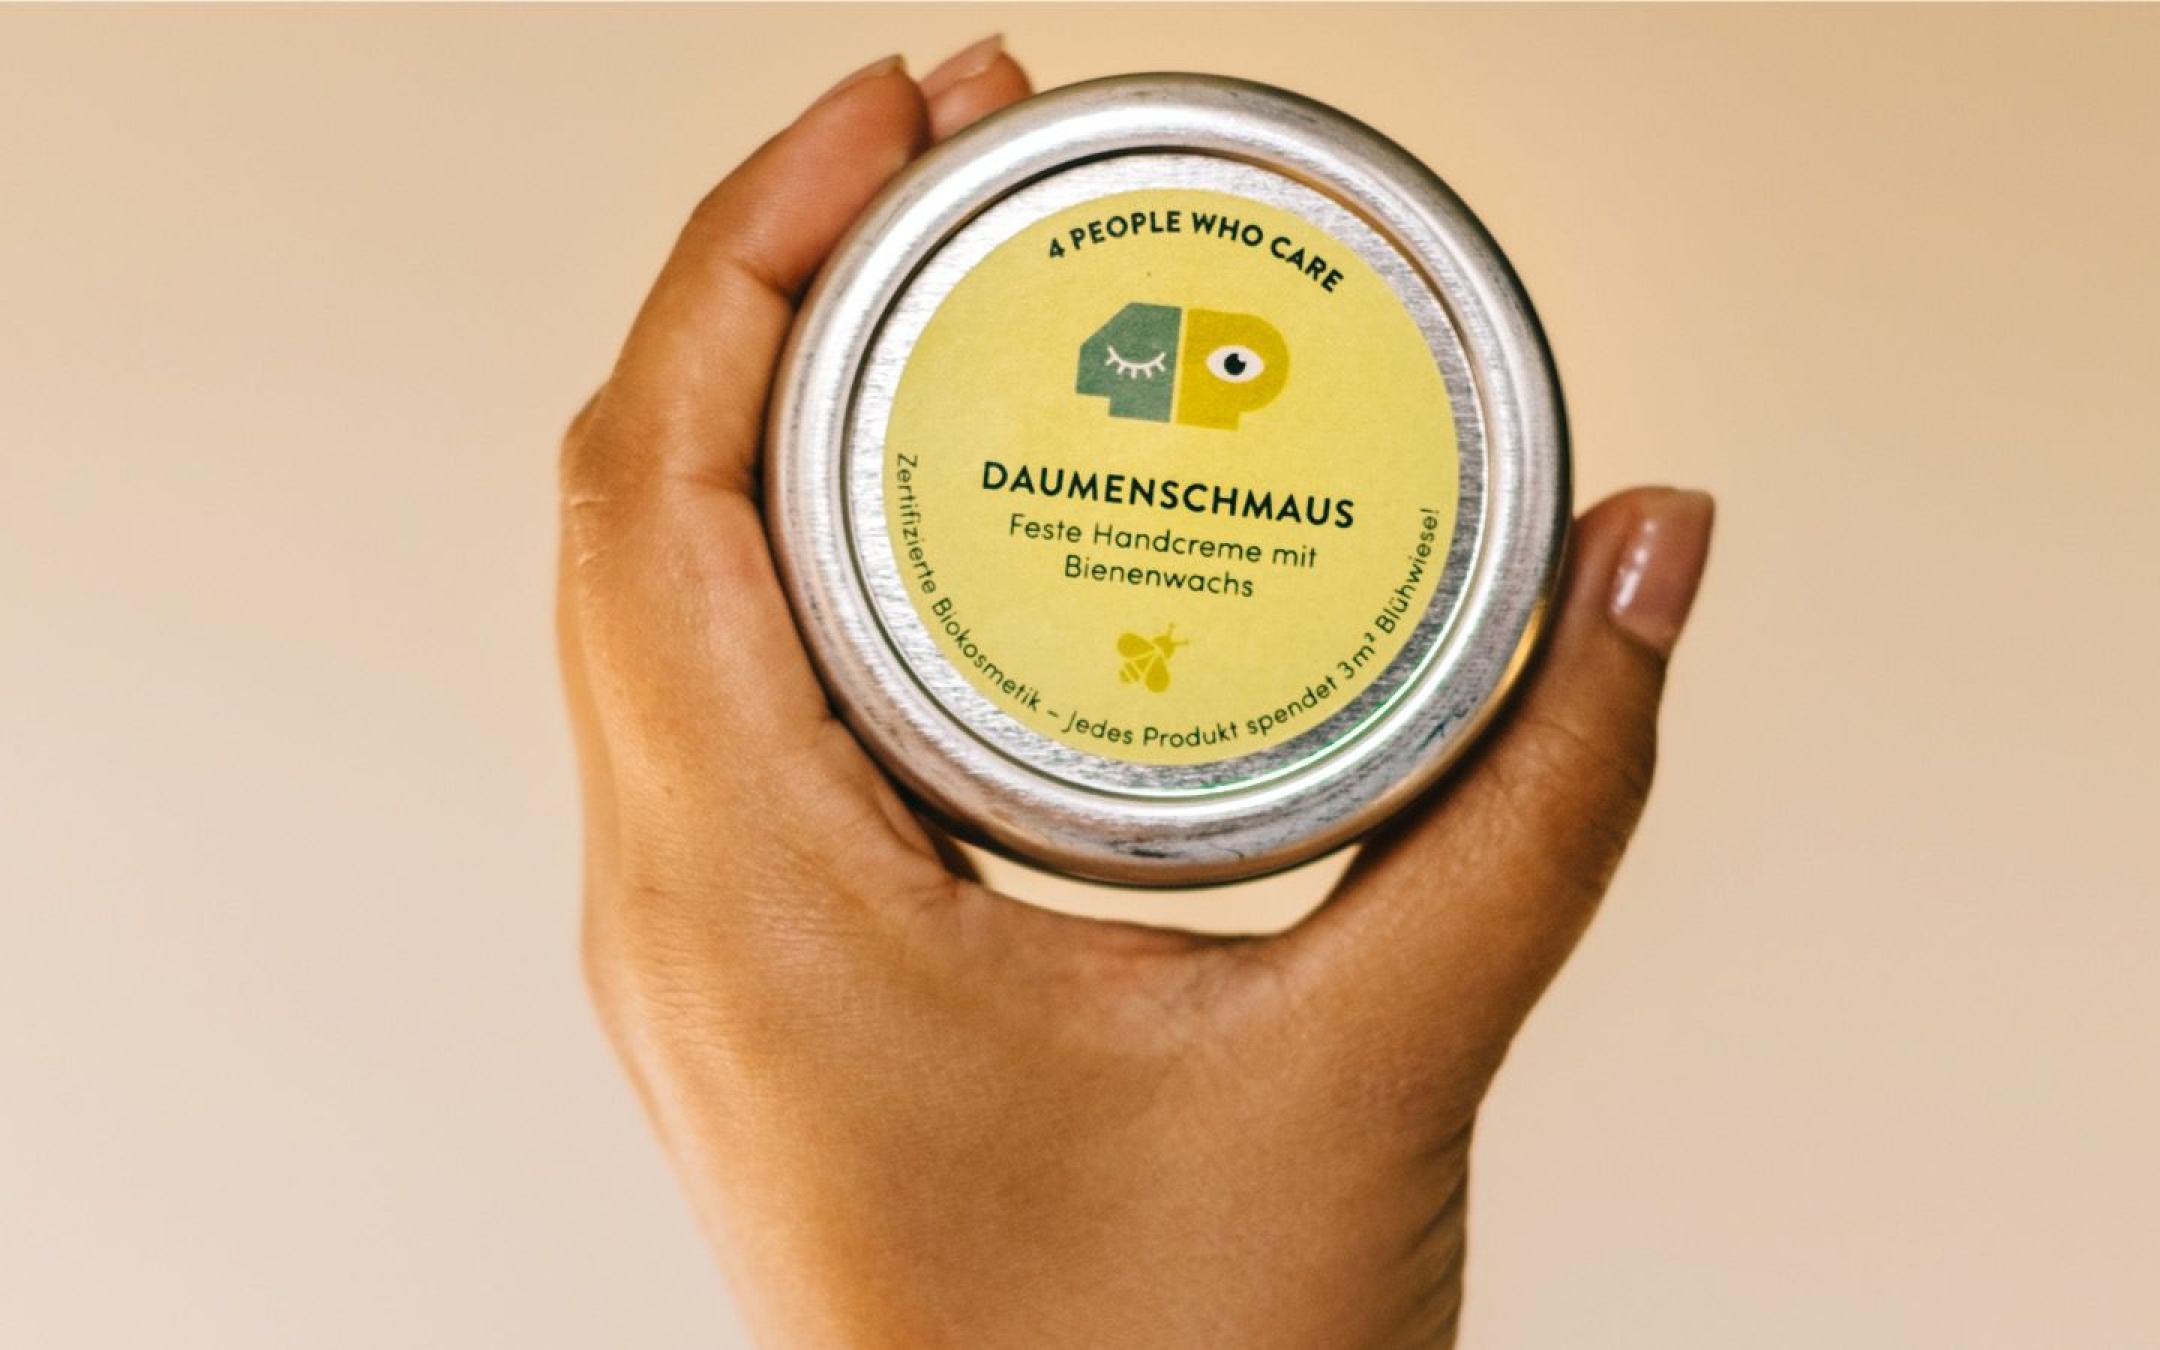 Daumenschmaus–Feste Handcreme